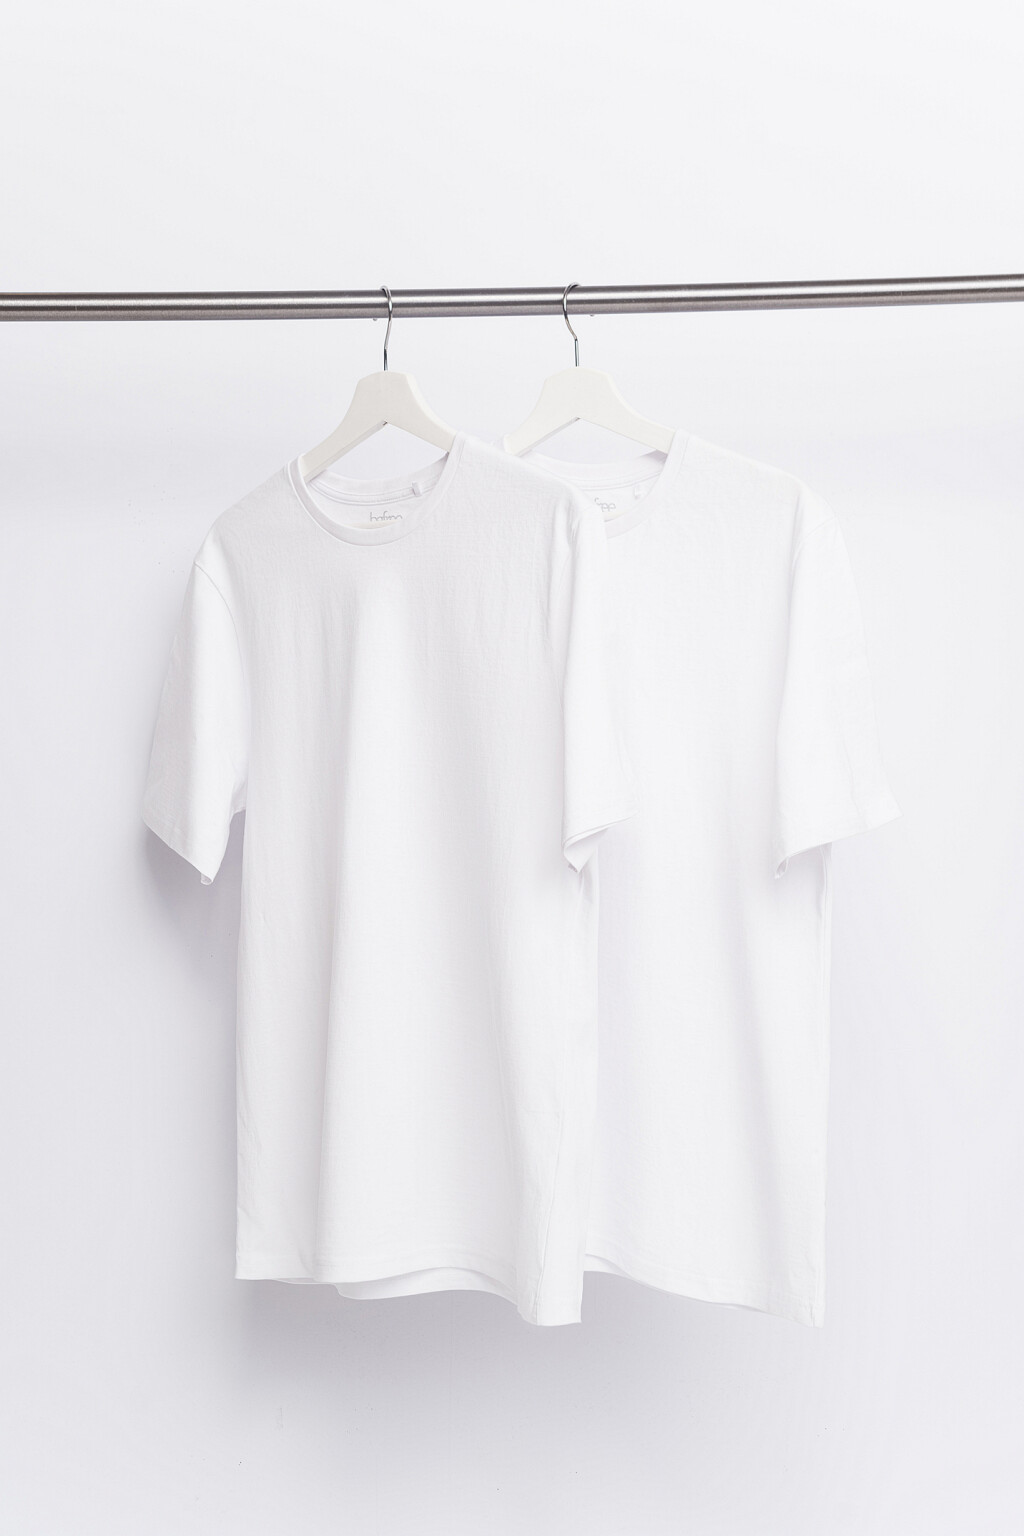 набор футболок мужских (2 шт.)